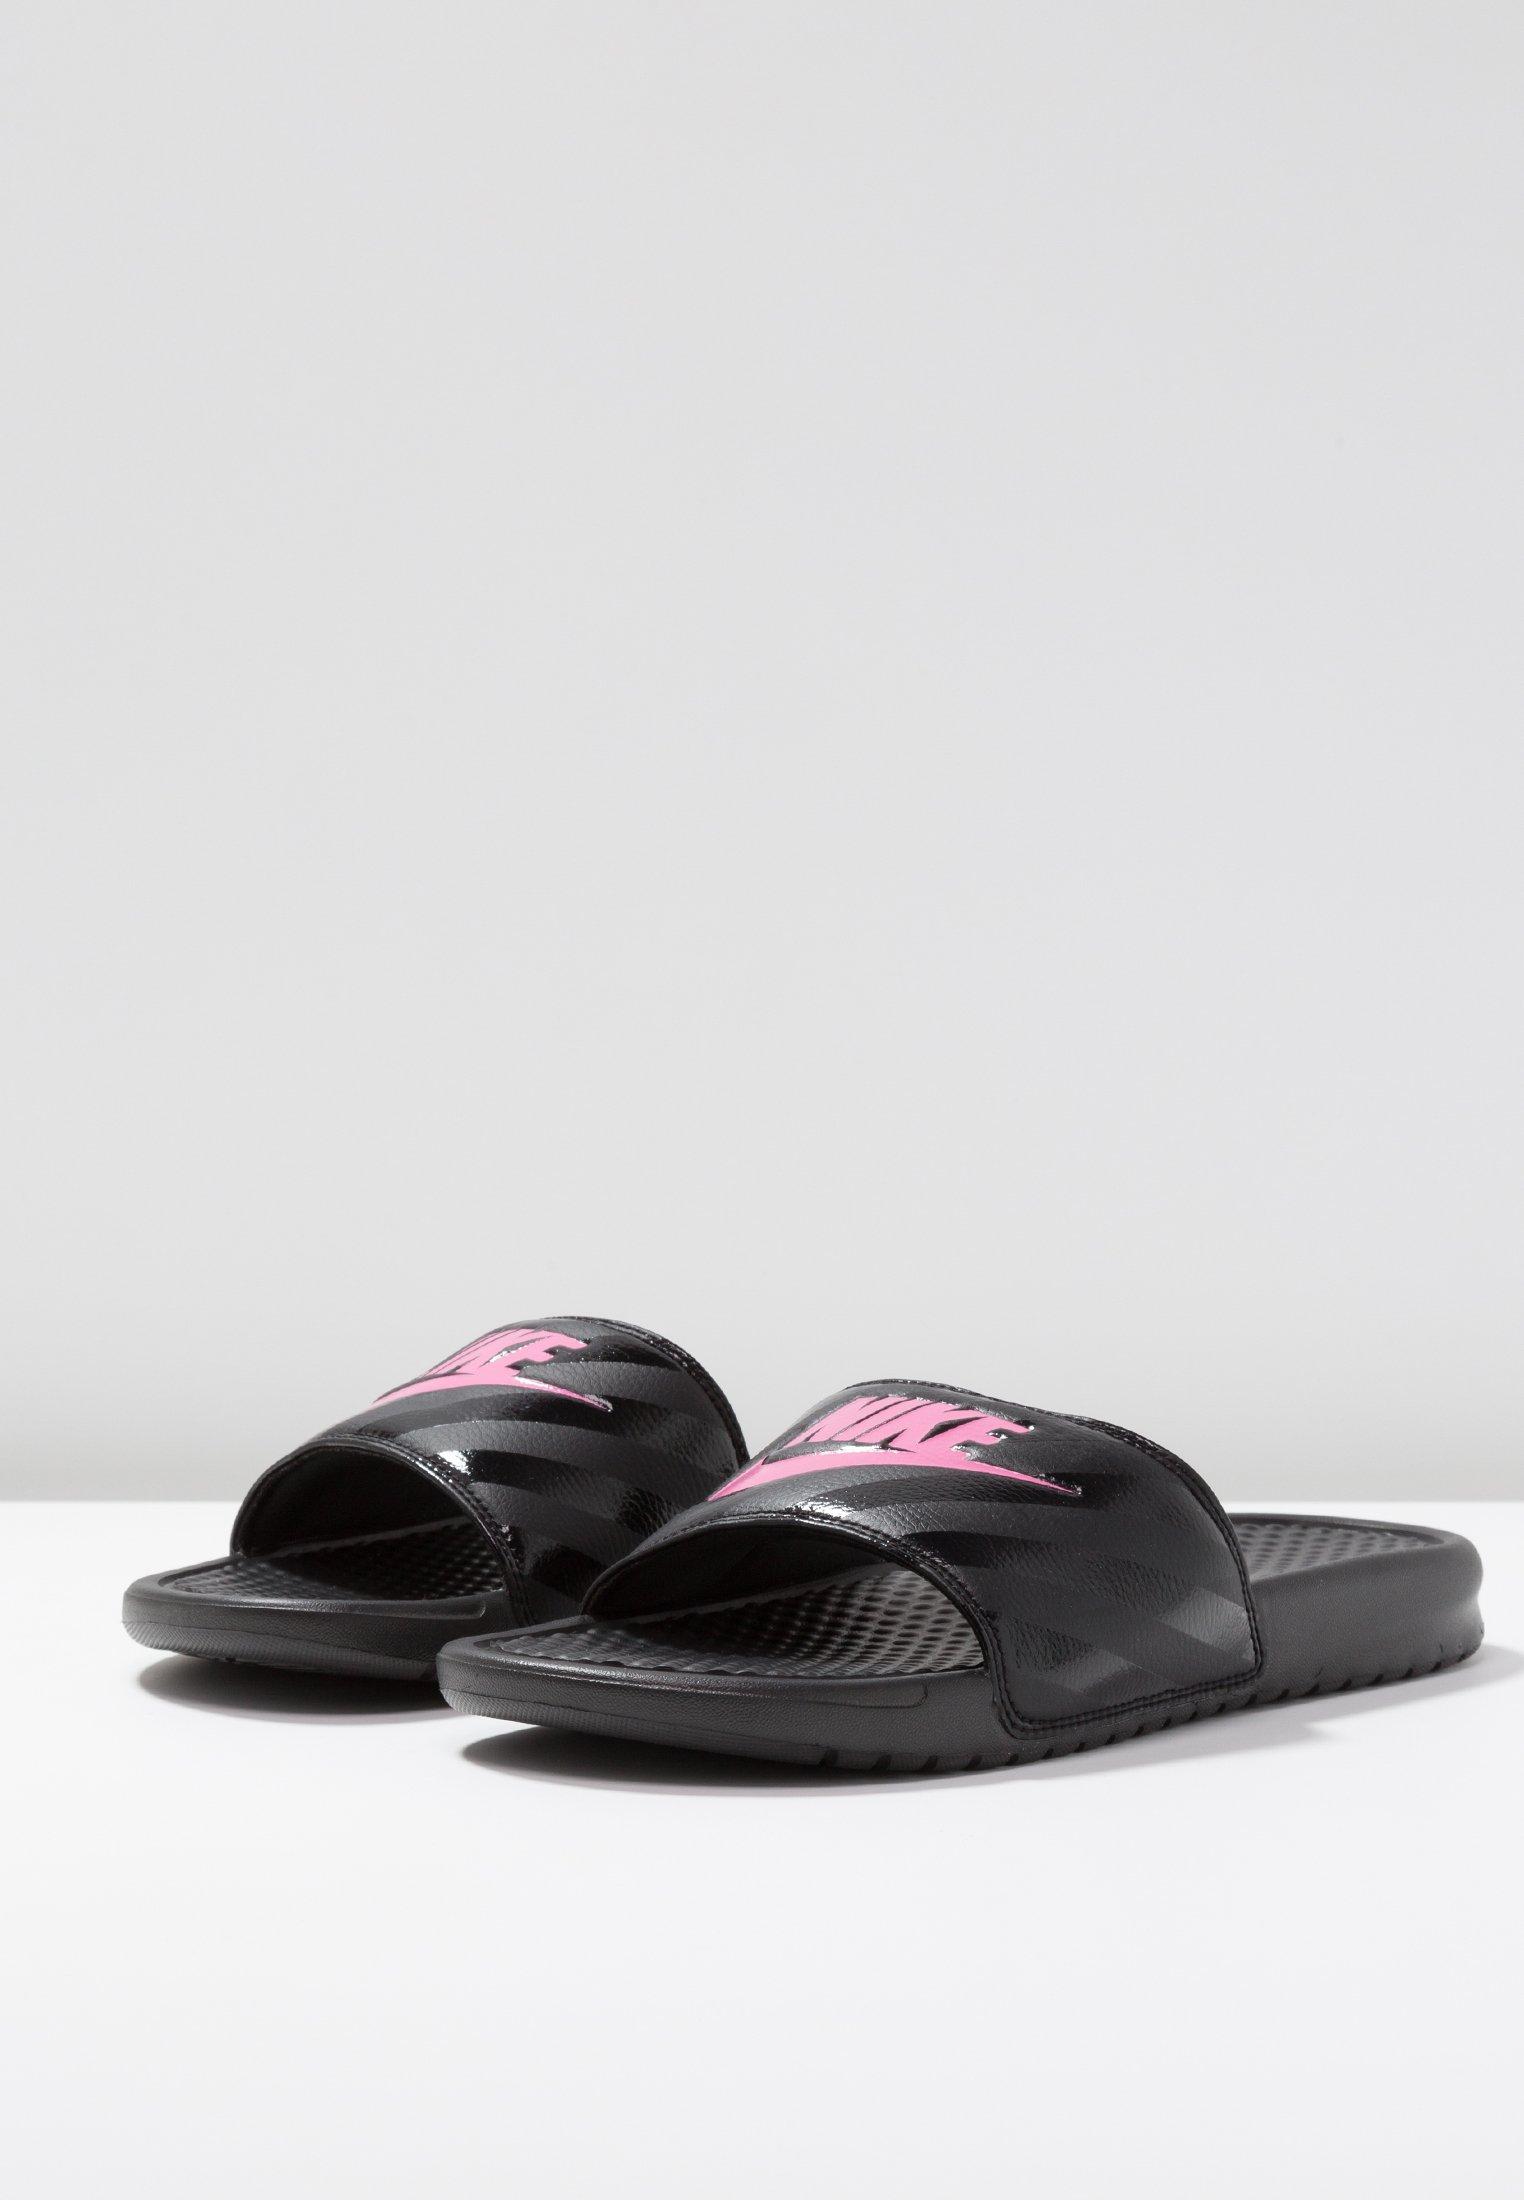 JdiMules vivid Pink Benassi Sportswear Black Nike A5j4LR